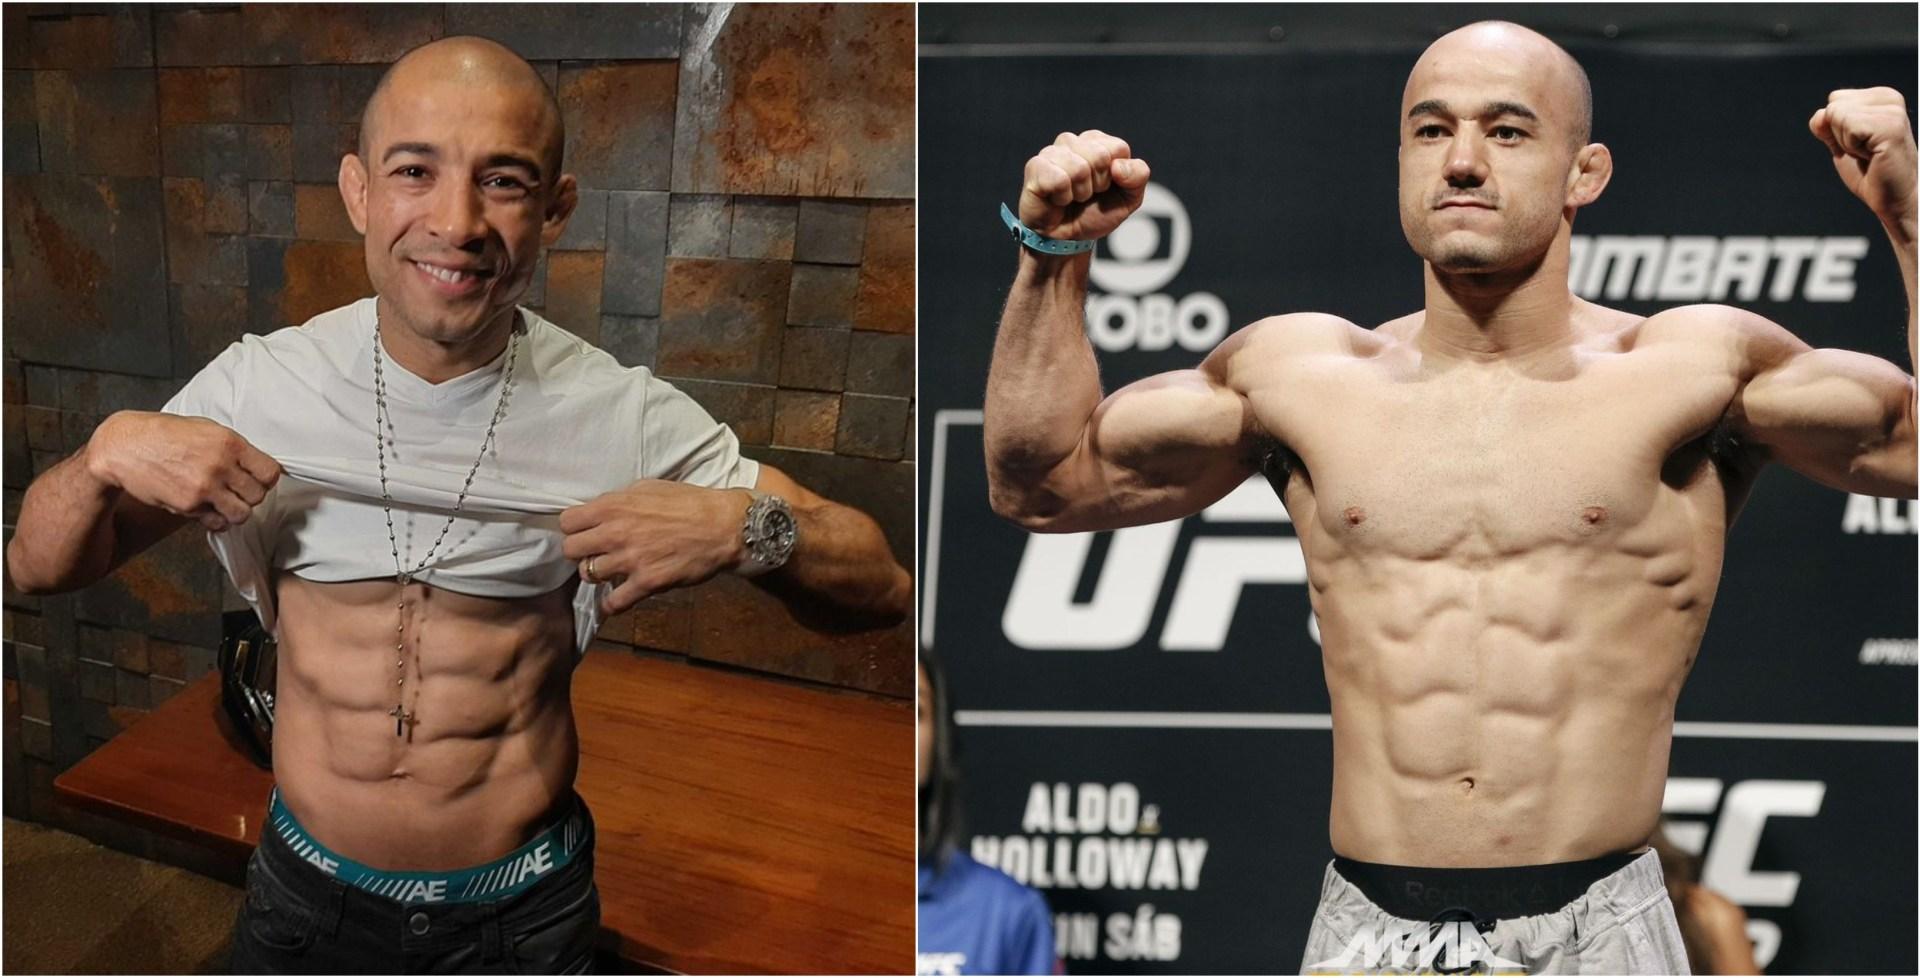 Jose Aldo to fight bantamweight contender Marlon Moraes at UFC 245 - Aldo